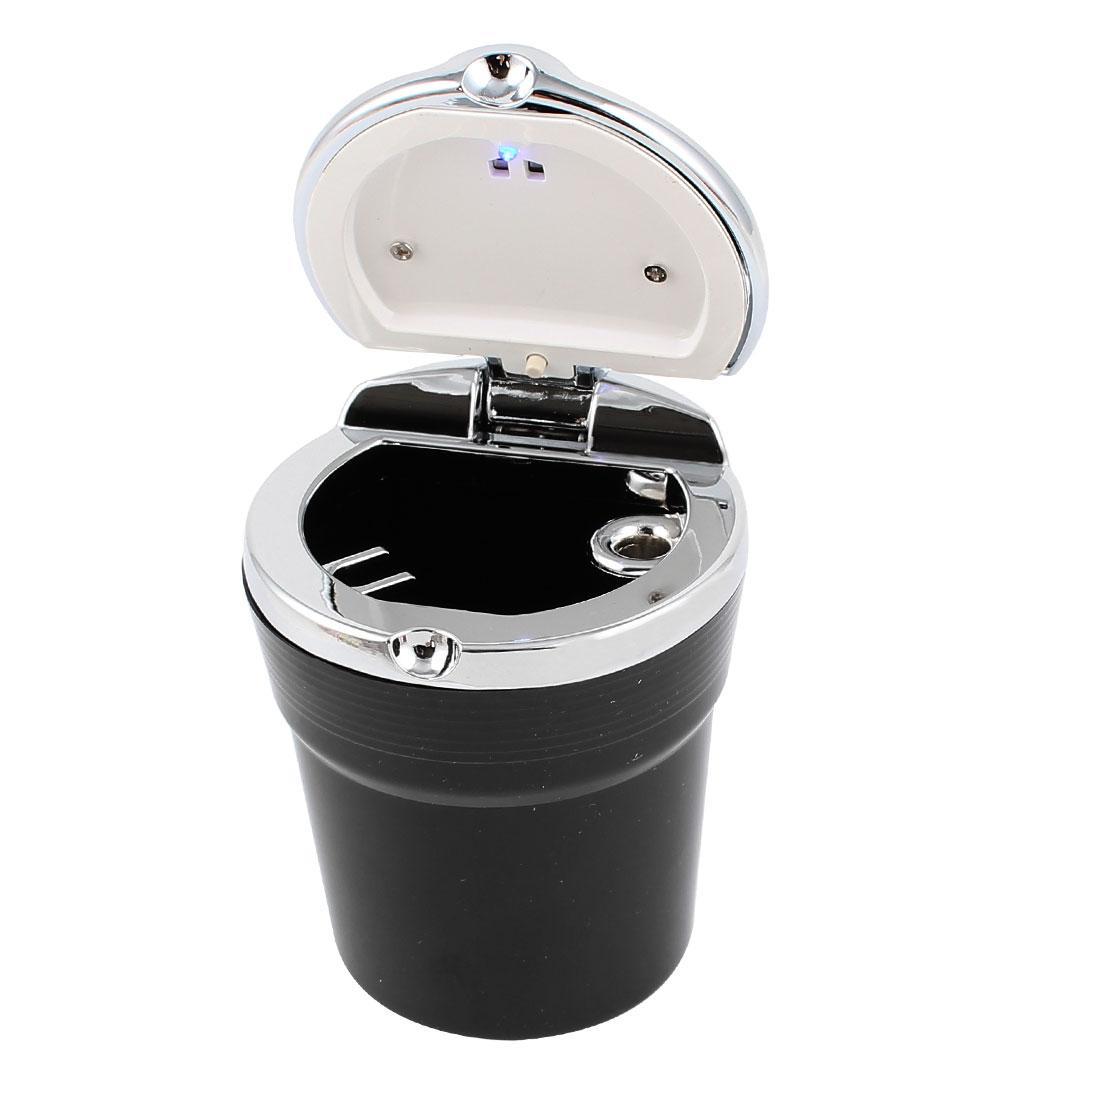 Portable Smokeless Ashtray for Car Auto, with Blue  Light, Black